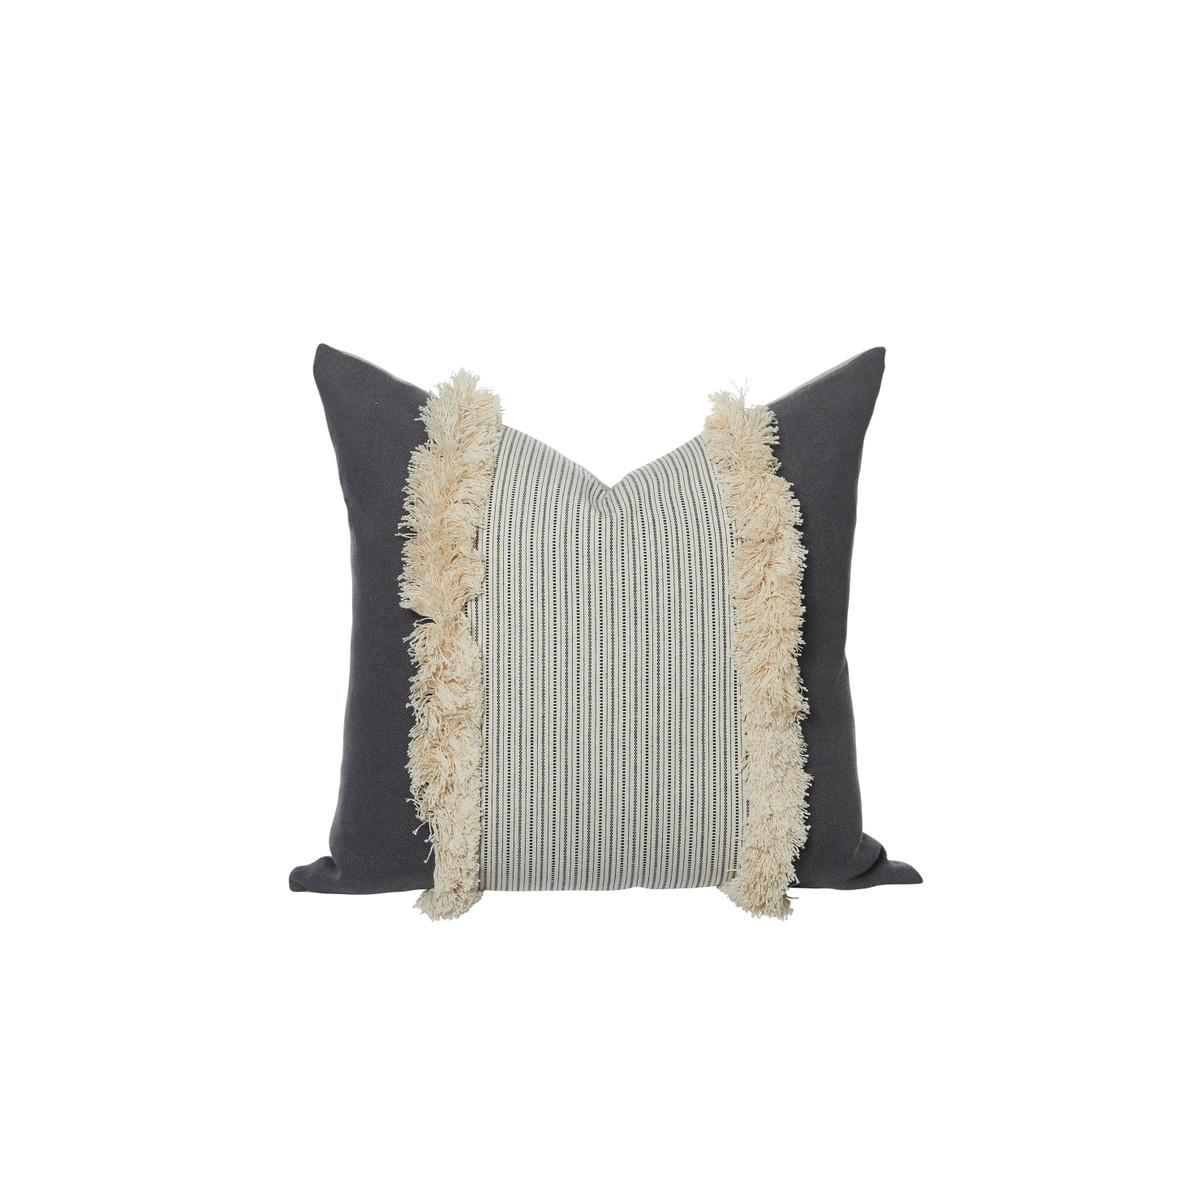 Aurelle Gray Linen Fringe Pillow - Front